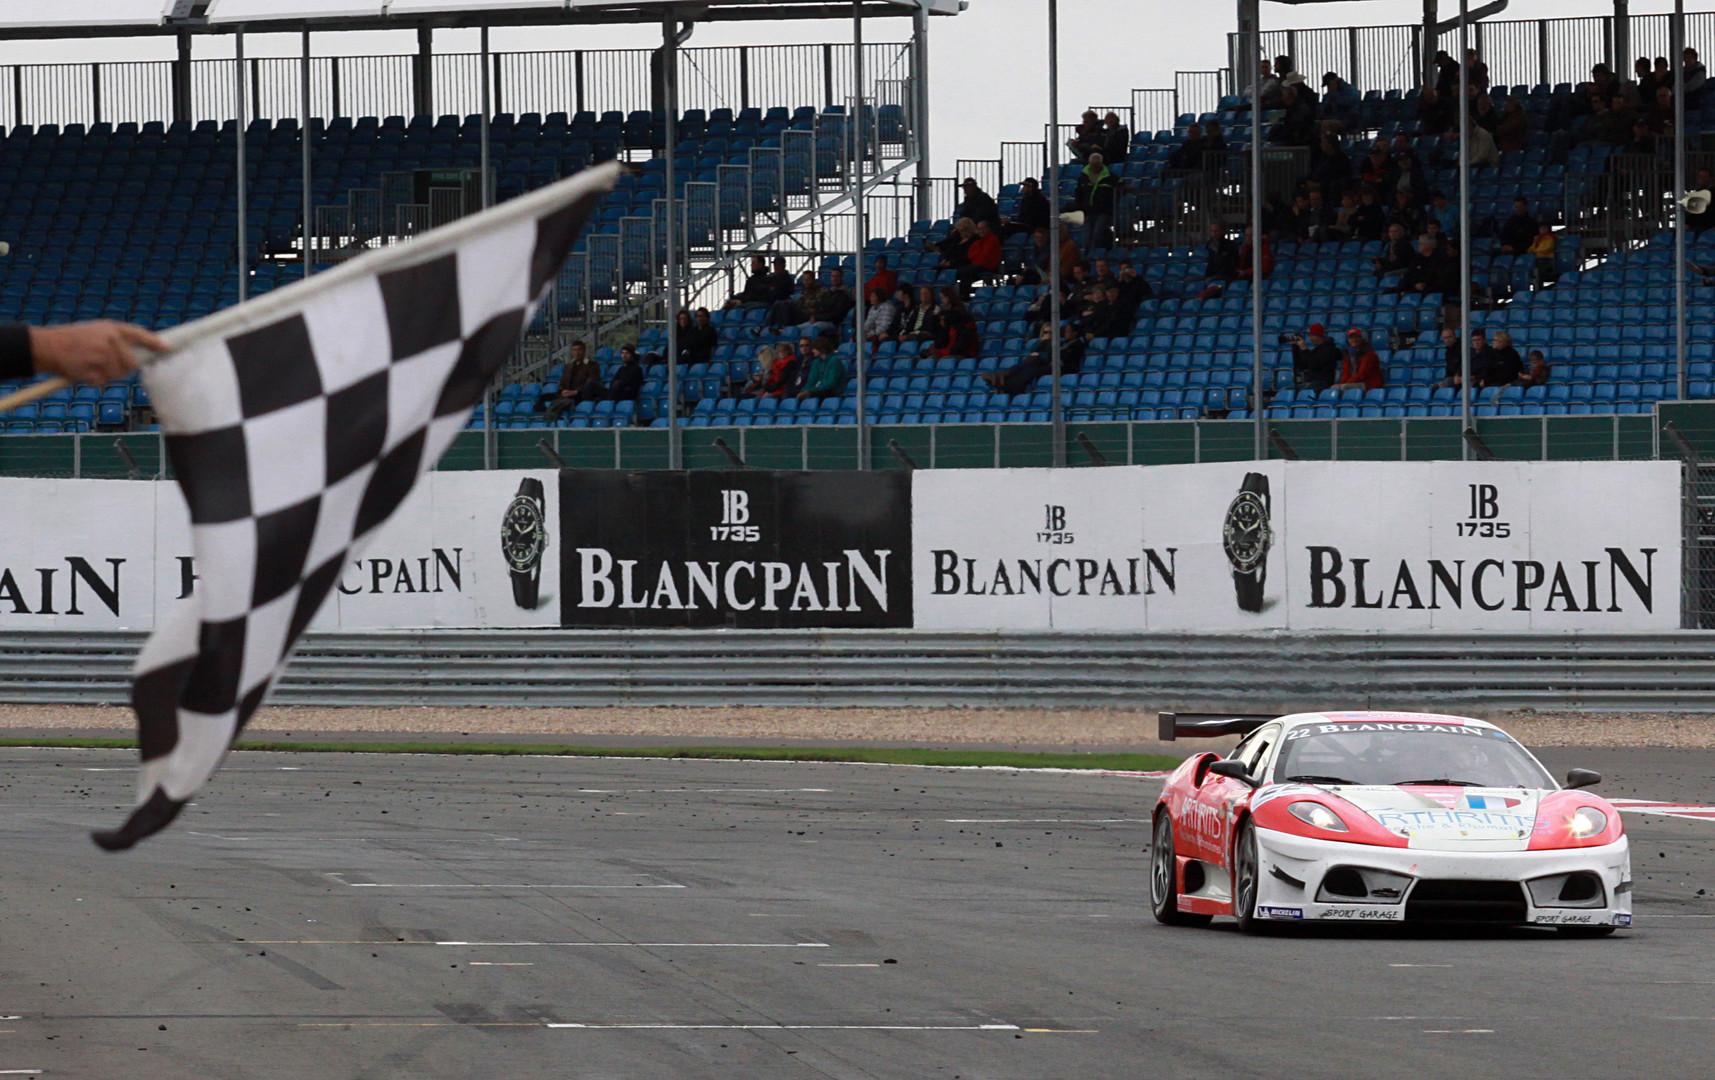 Winning Silverstone Blancpain Endurance series Silverstone, Ferrai 430 Scuderia GT3